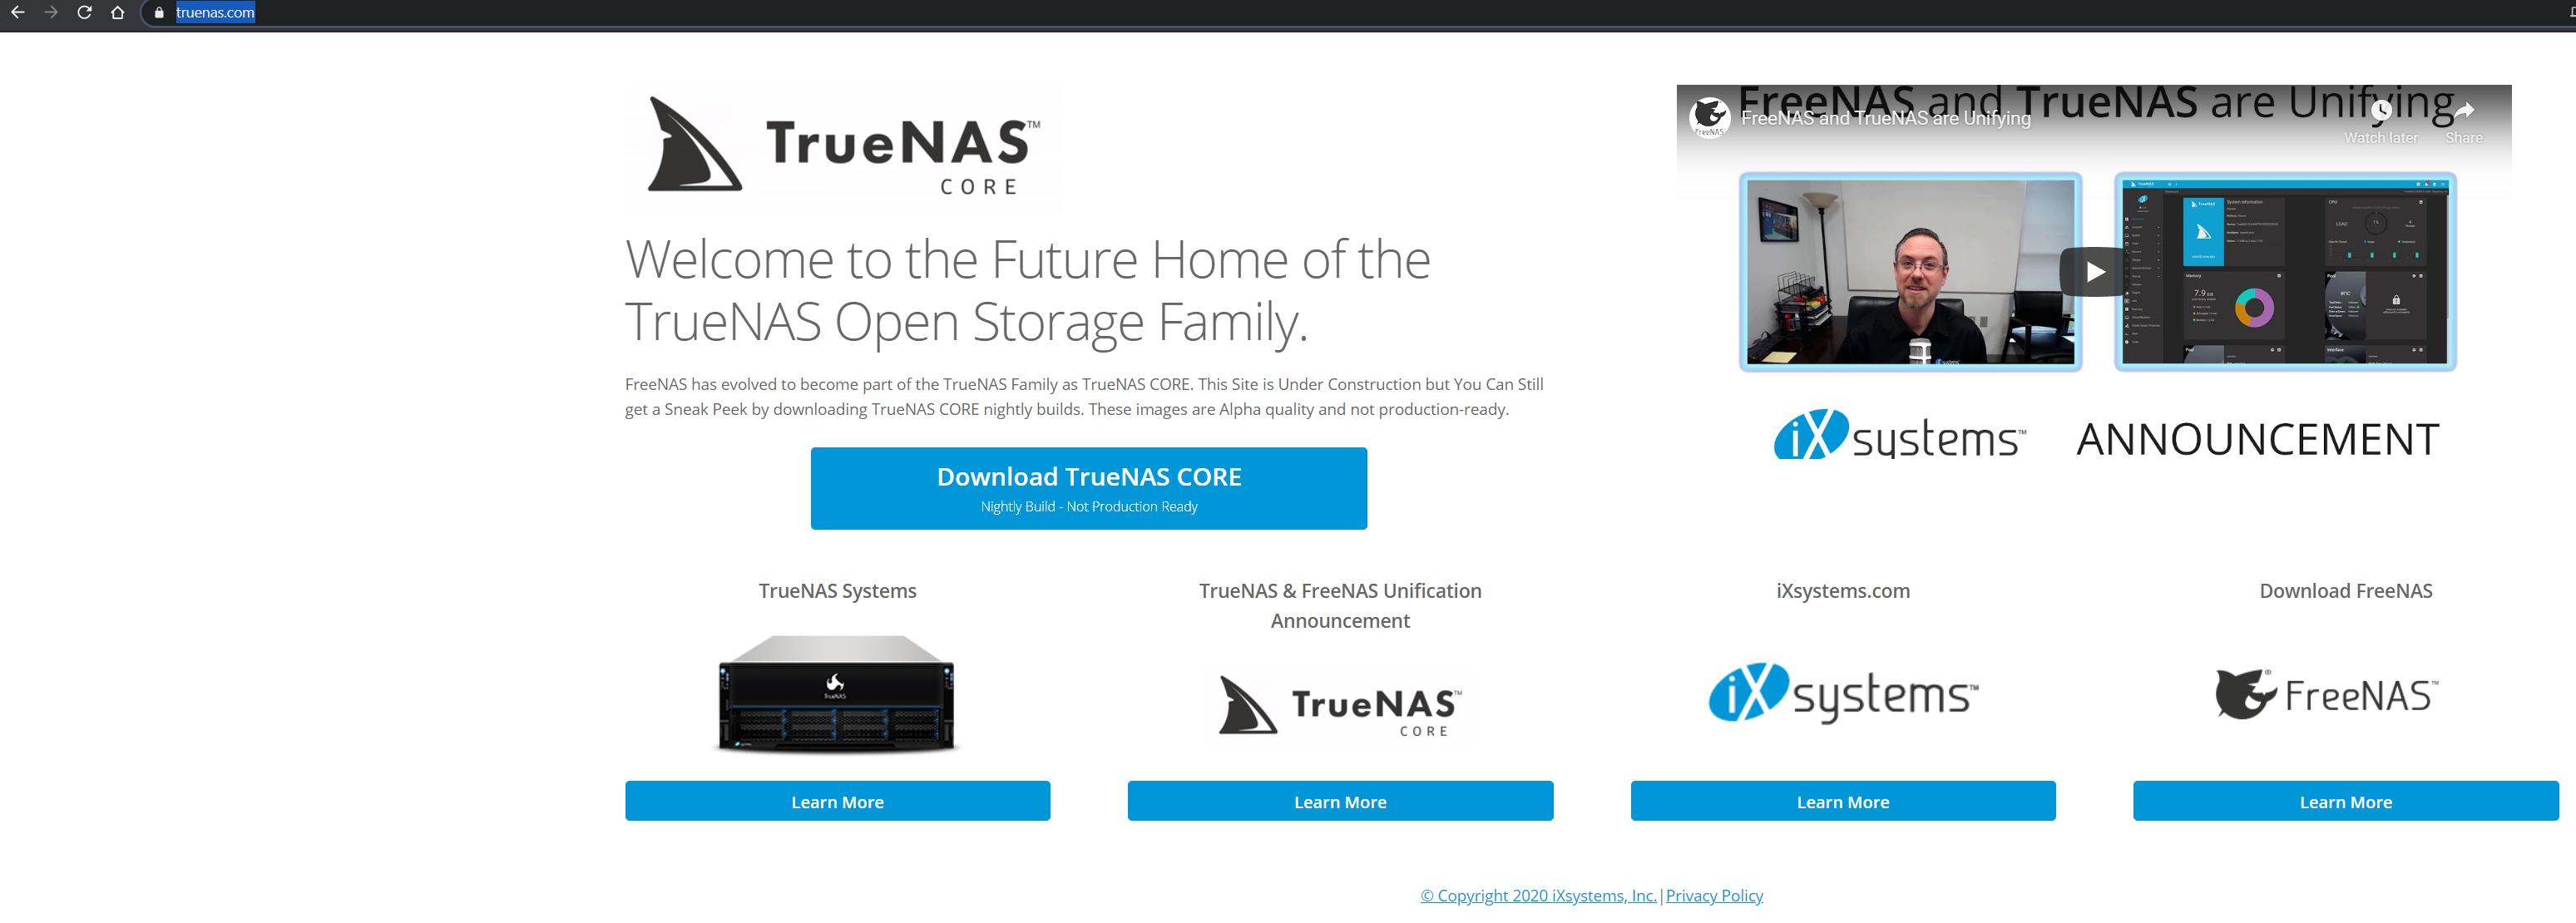 install truenas core